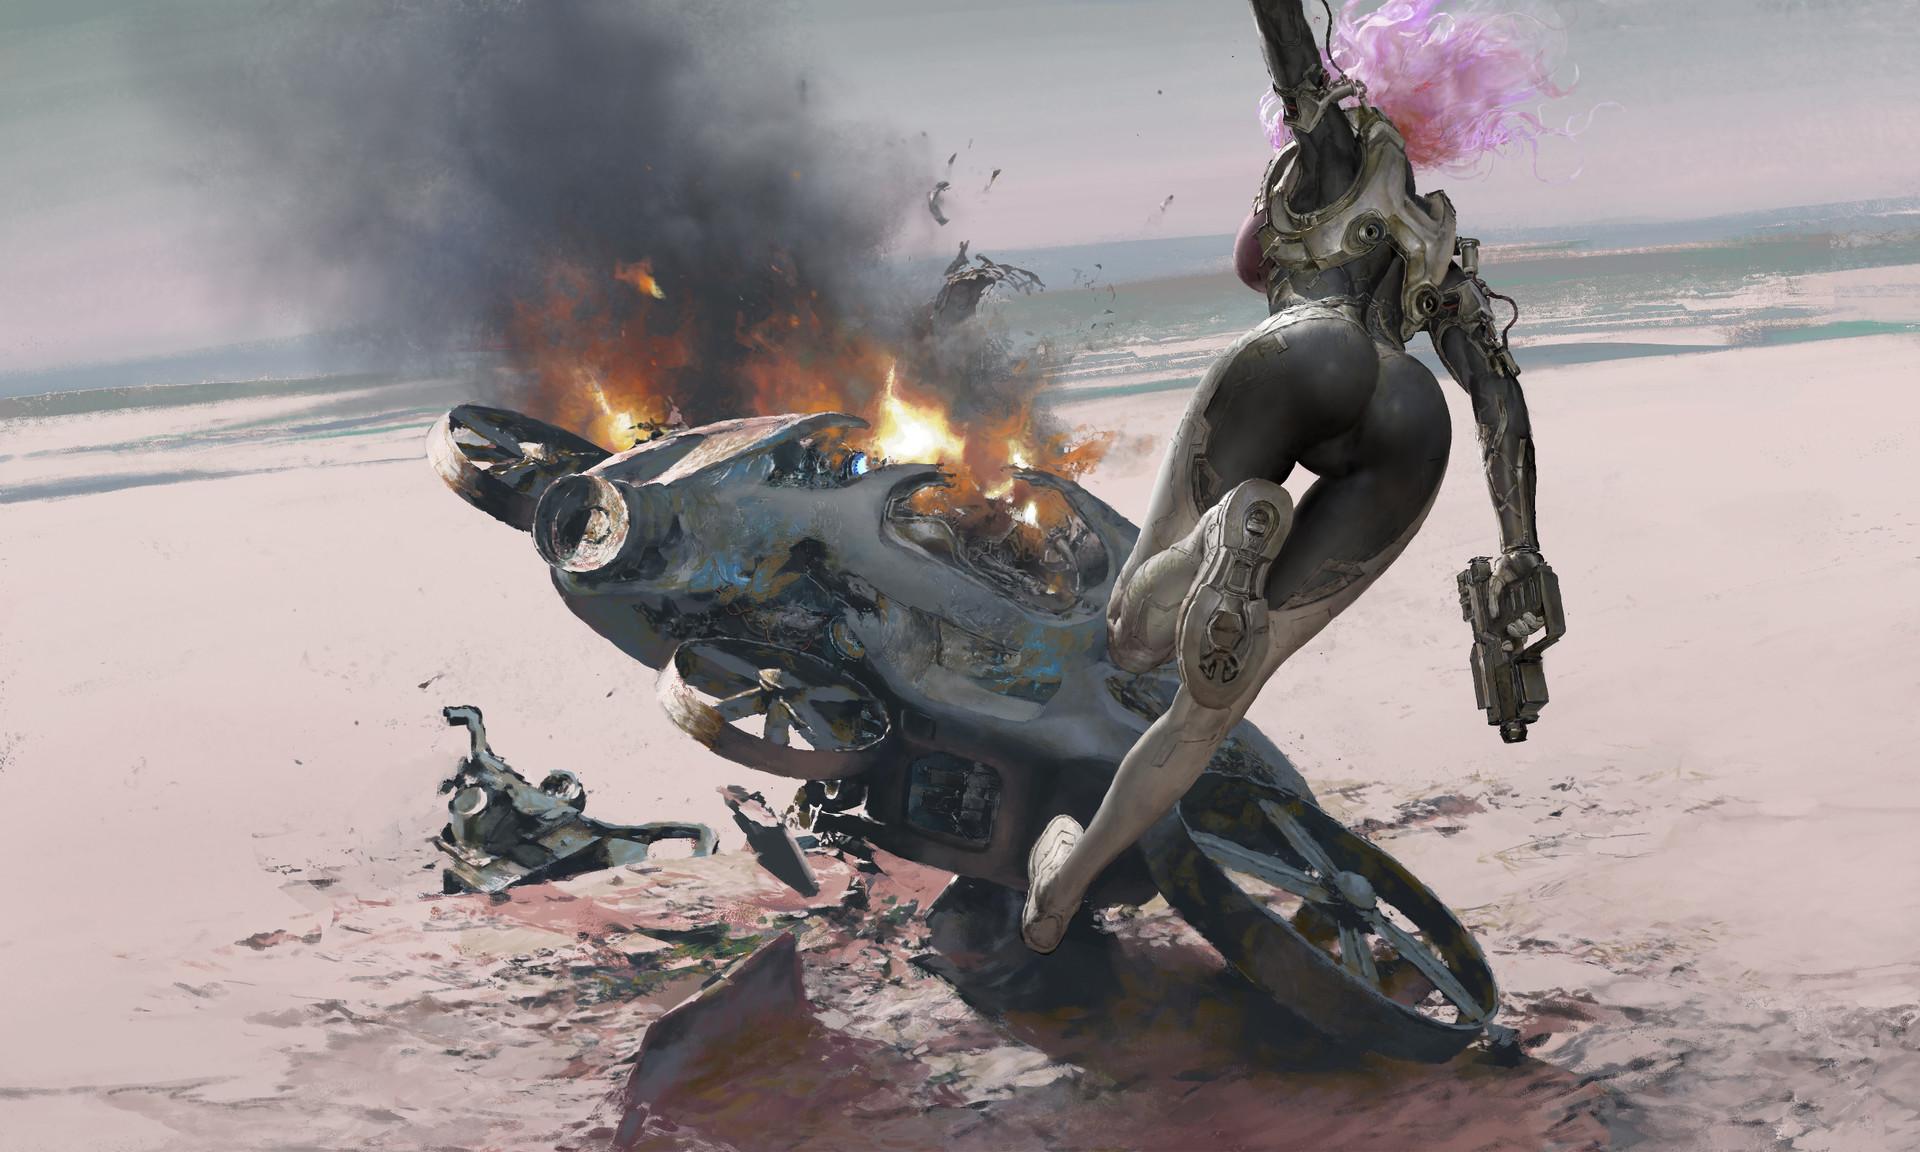 The Magnificent Sci-Fi & Fantasy Art of Ruan Jia